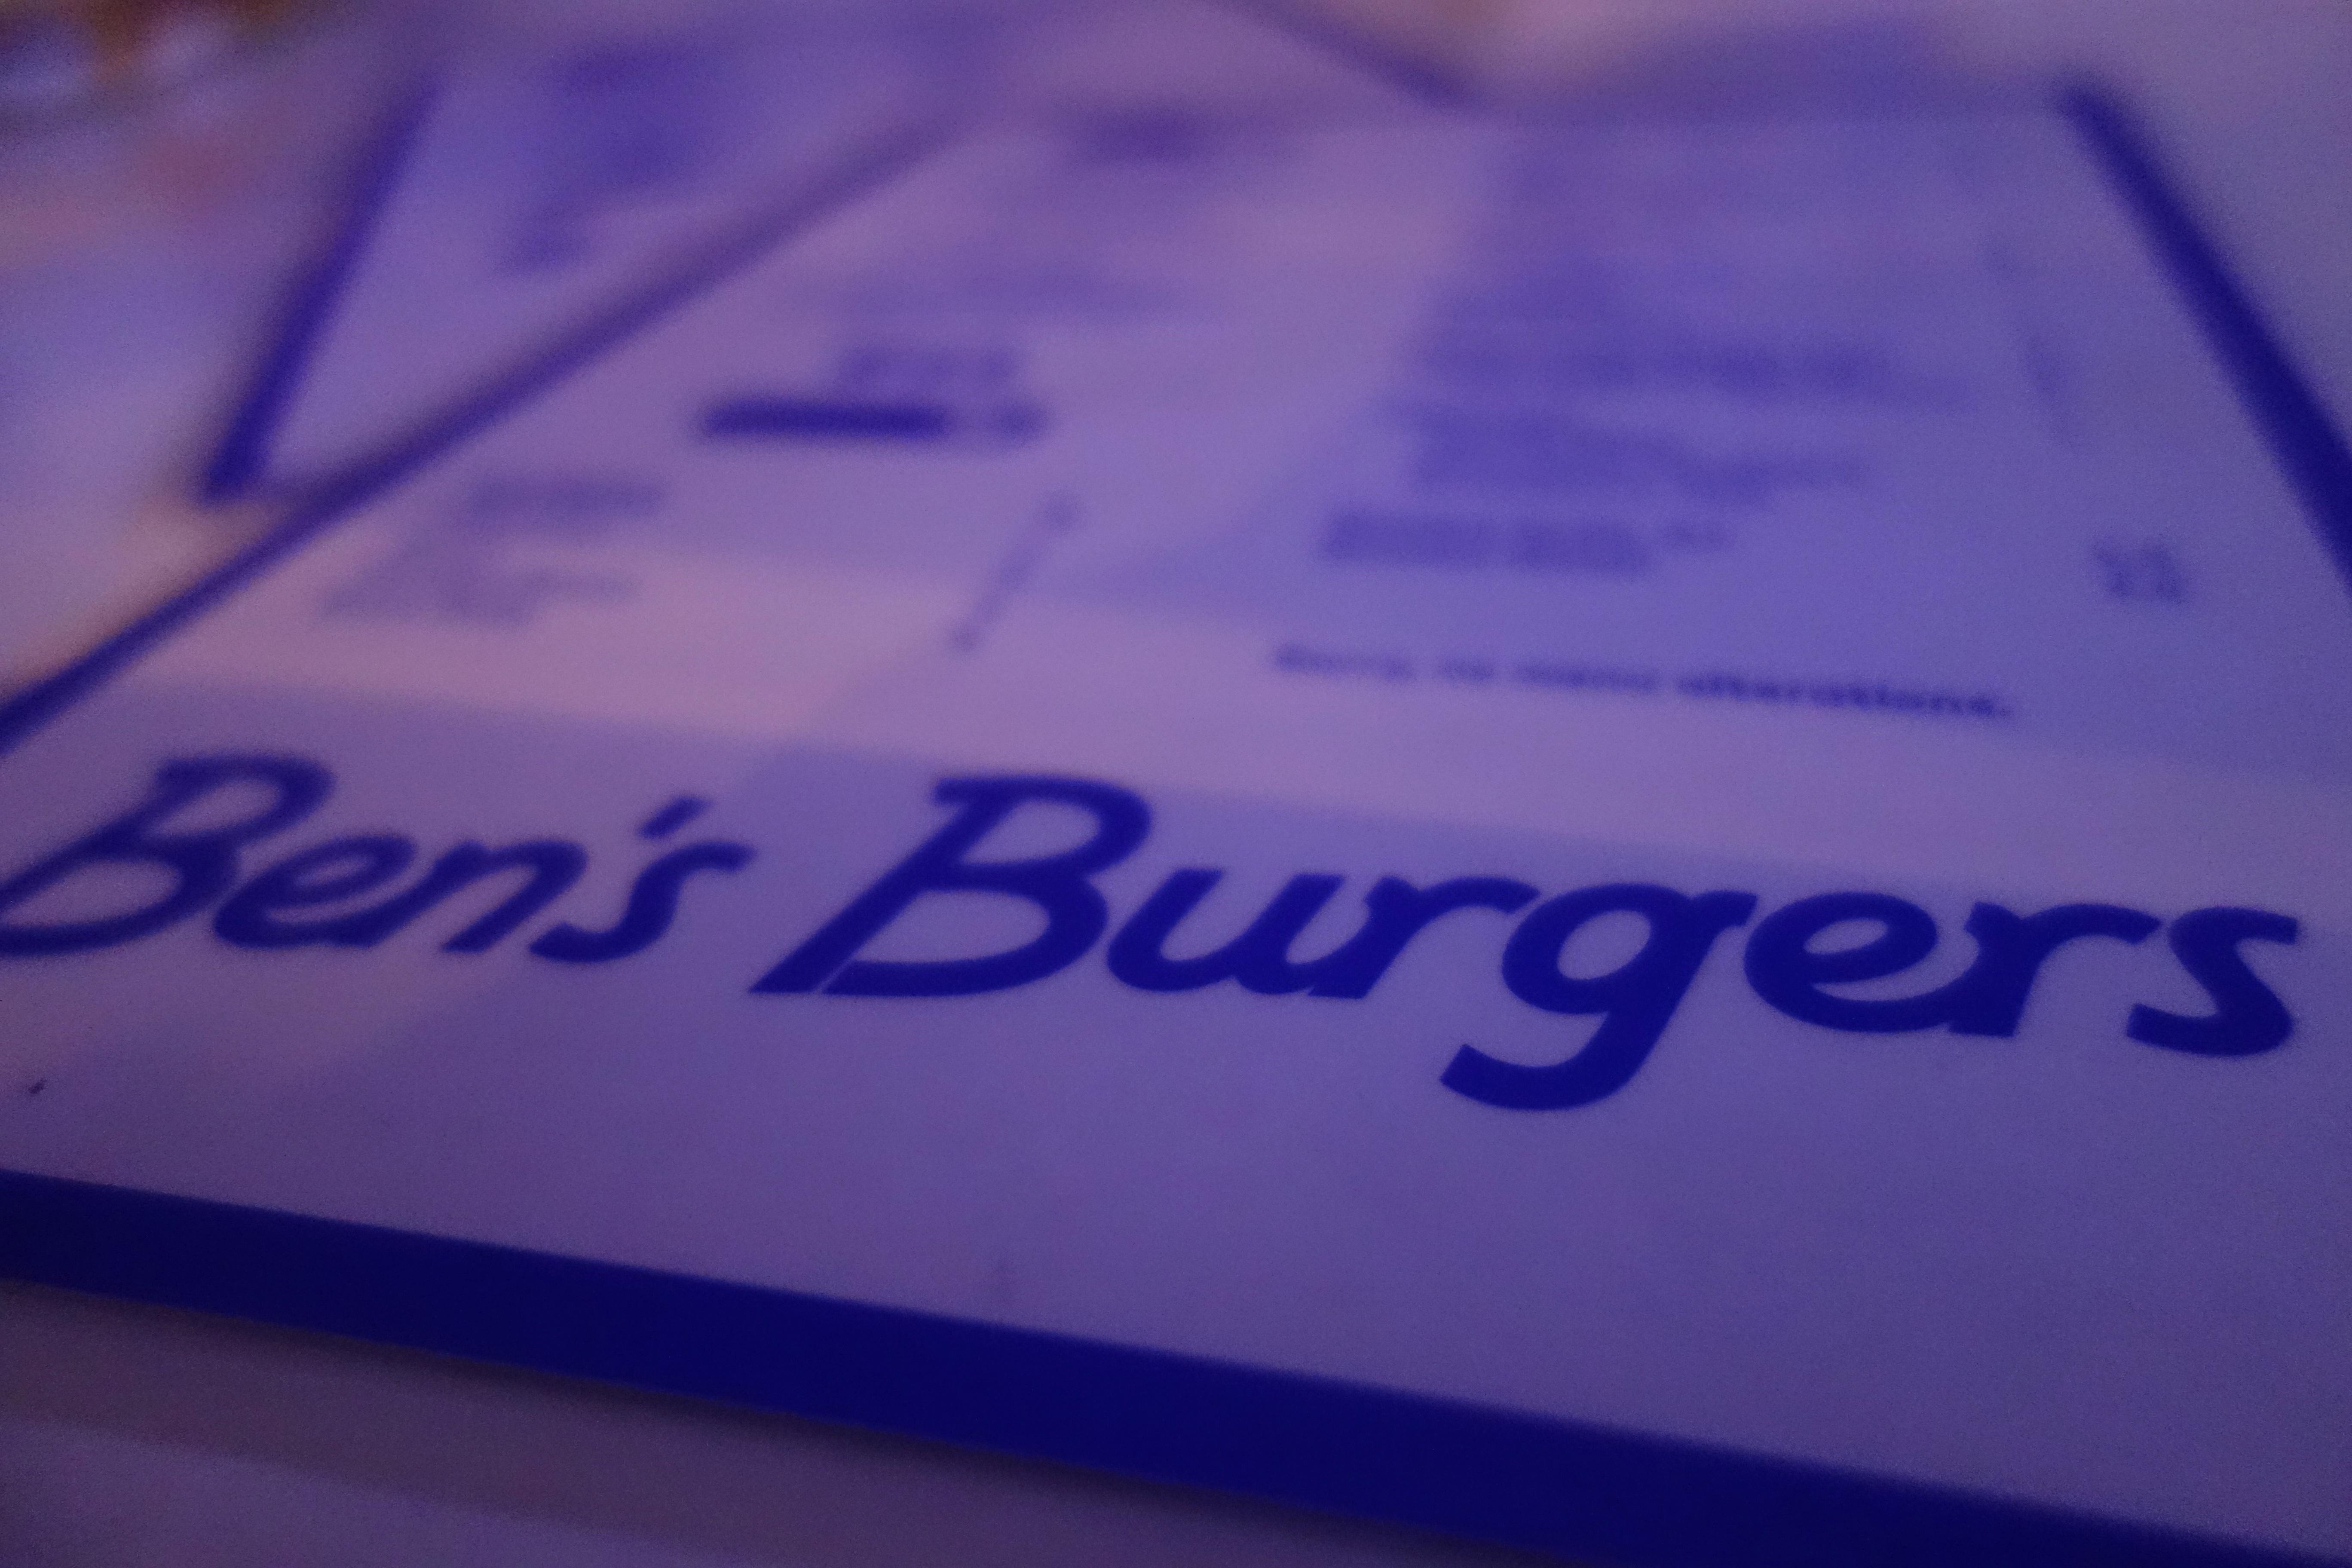 Brisbane Eats | Ben's Burgers